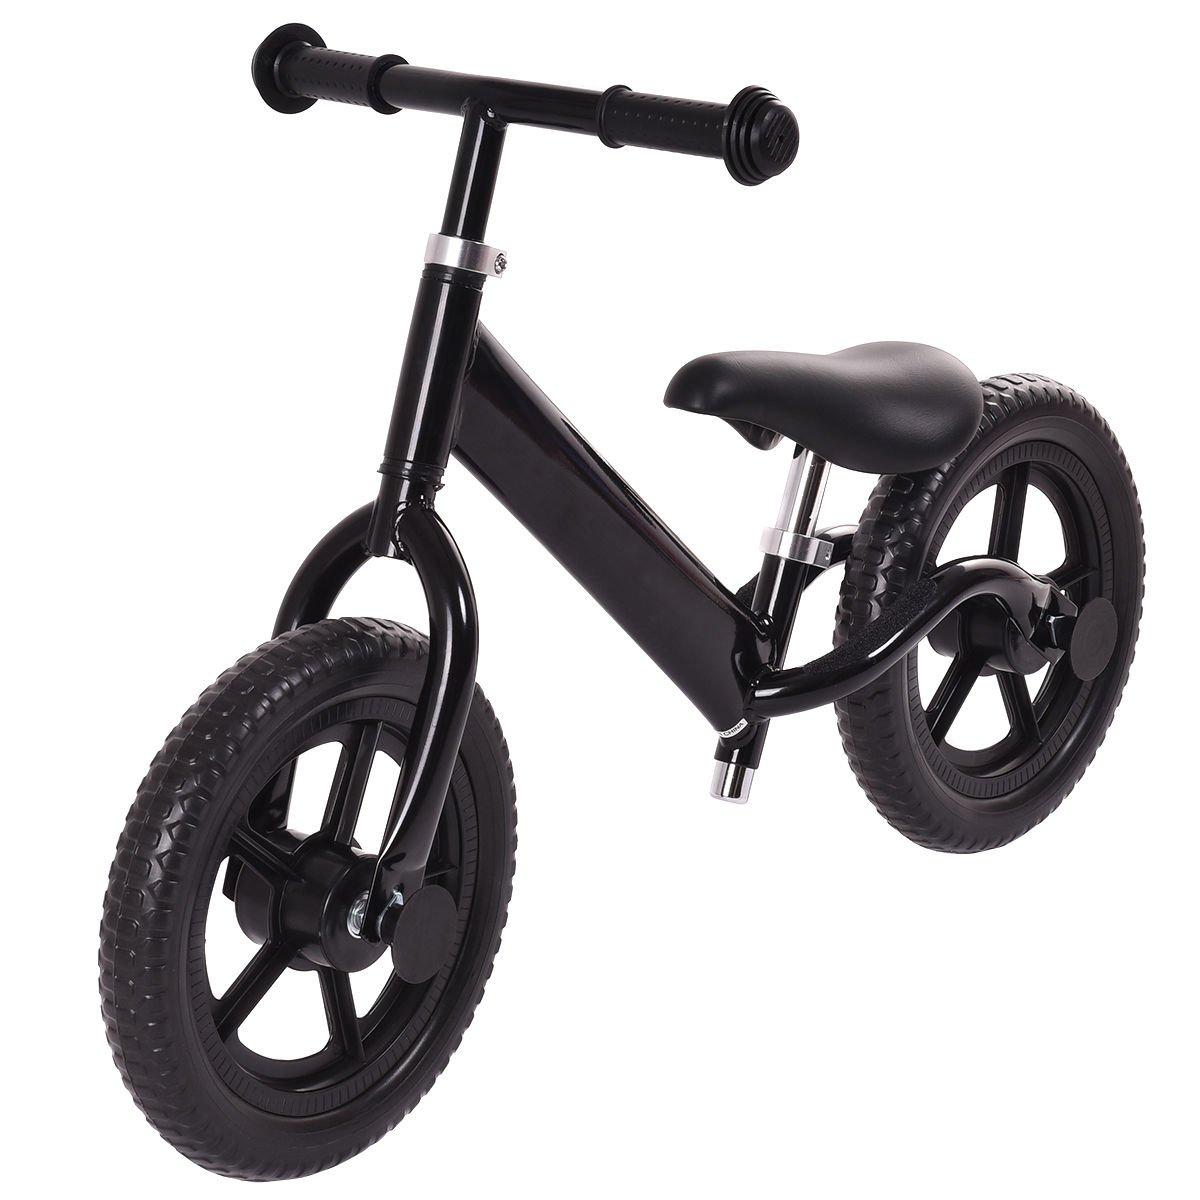 Costzon 12'' Classic No-Pedal Balance Bike Walking Bicycle for Kids Age 2-7 w/Adjustable Seat (Black)